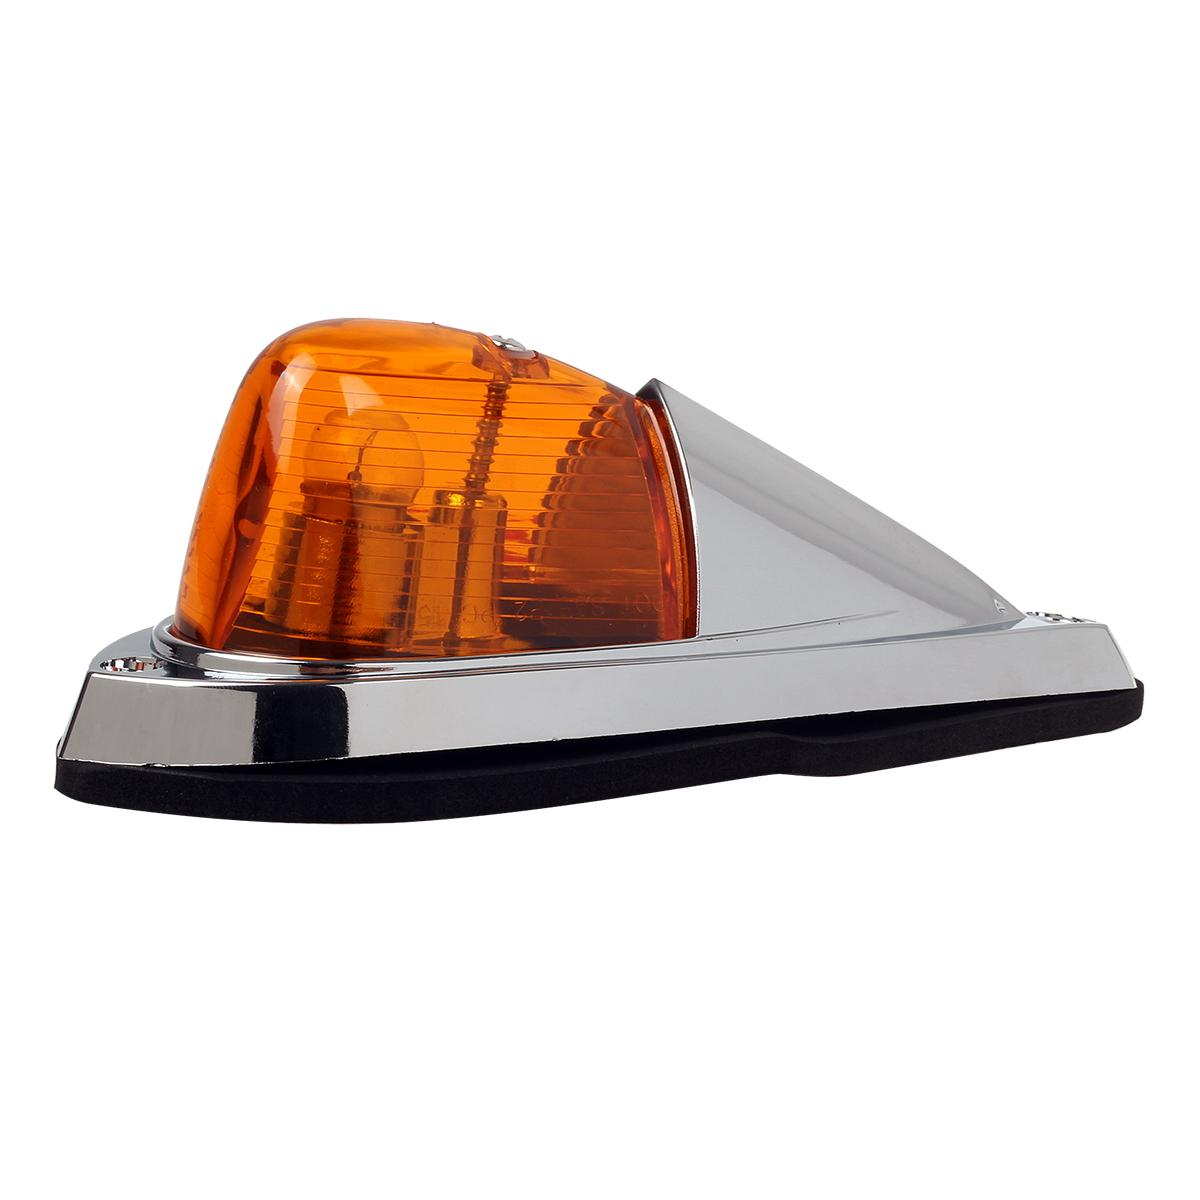 5pcs Teardrop Amber Cab Roof Truck Semi Trailer Clearance